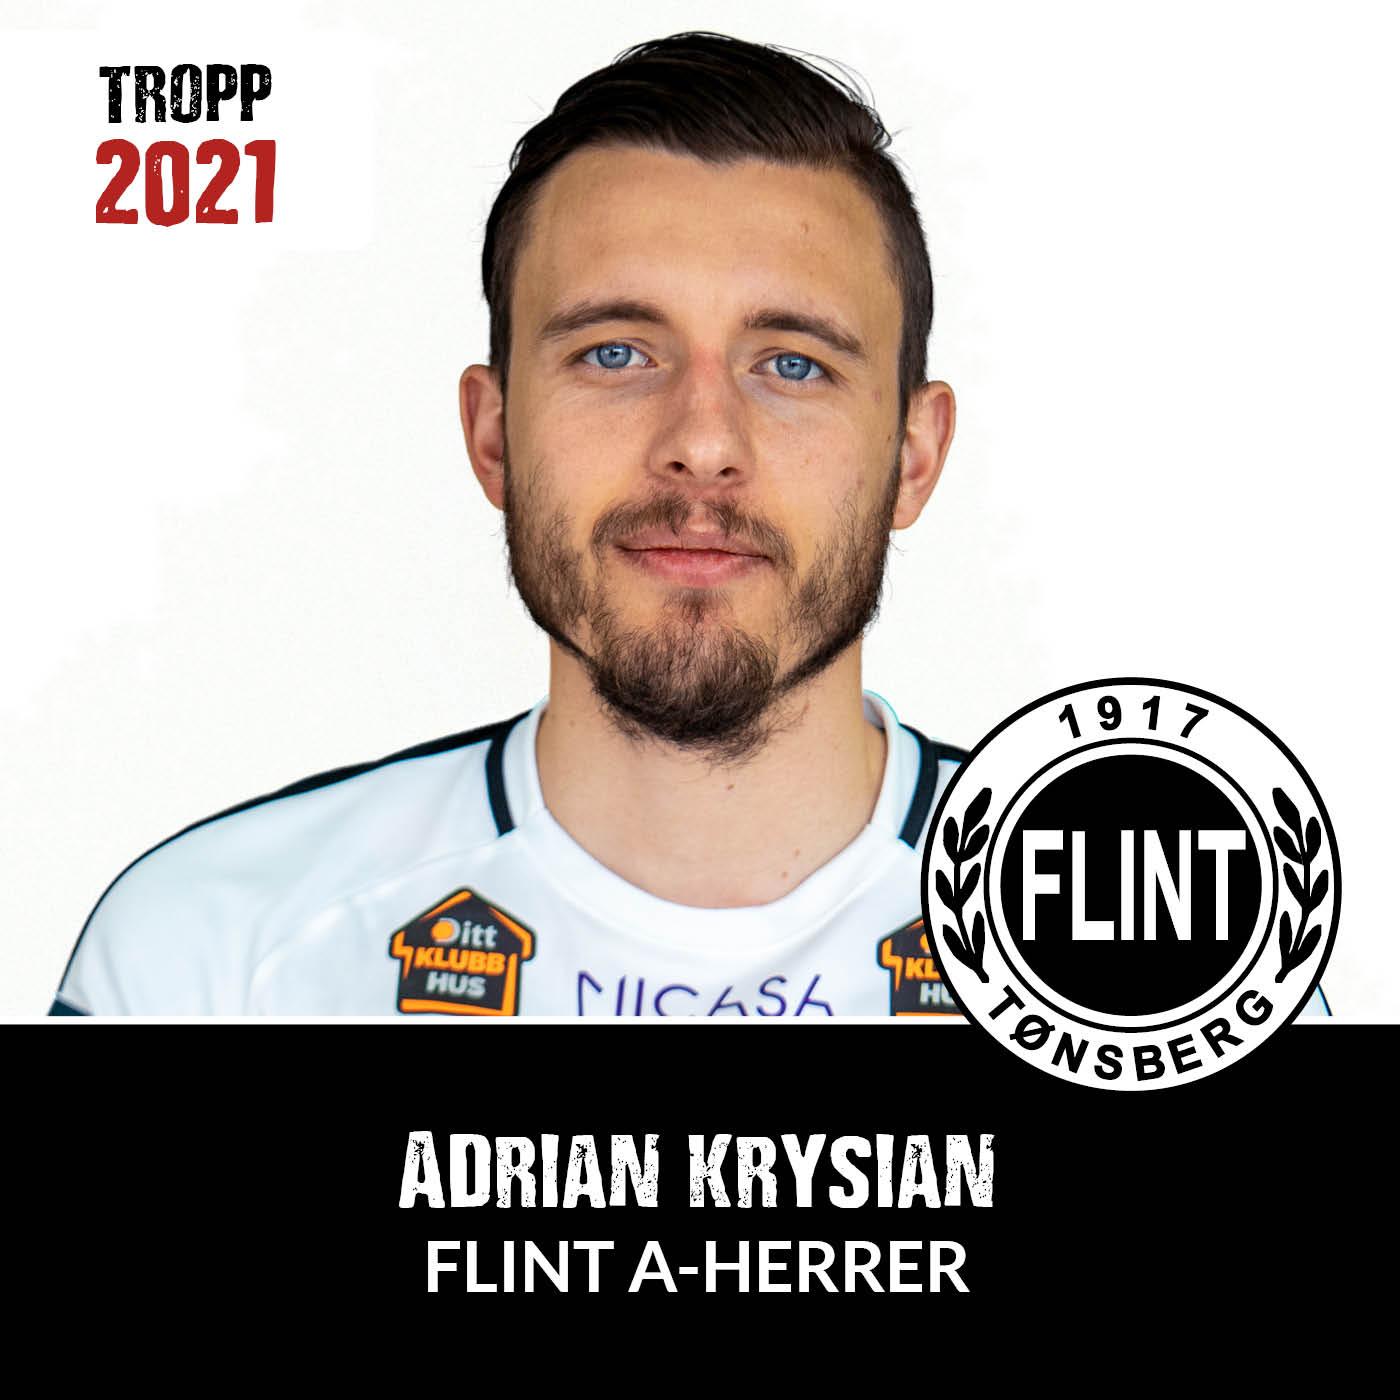 https://www.flintfotball.no/wp-content/uploads/2021/01/A-herrer-2021-Adrian-Krysian.jpg